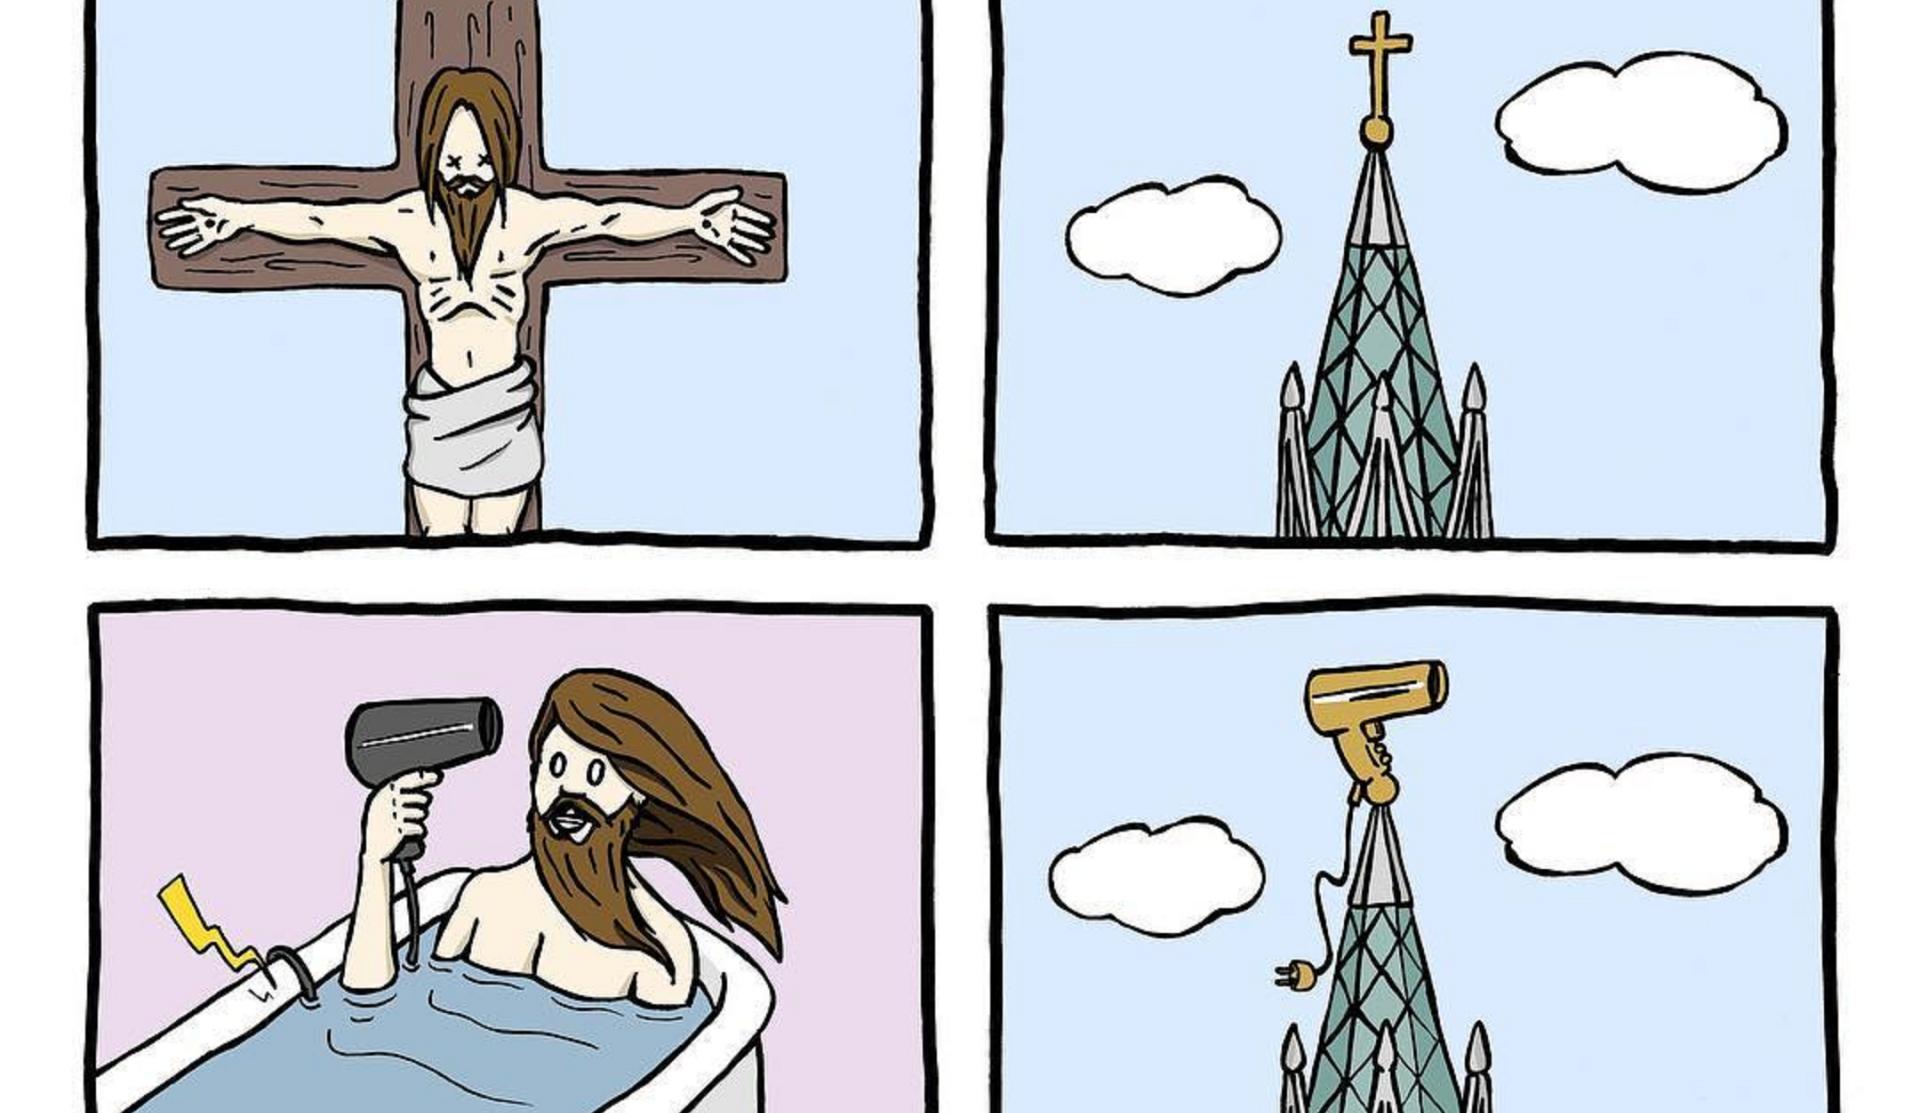 Rémi Lascault o por qué las iglesias podrían usar secadores en vez de cruces